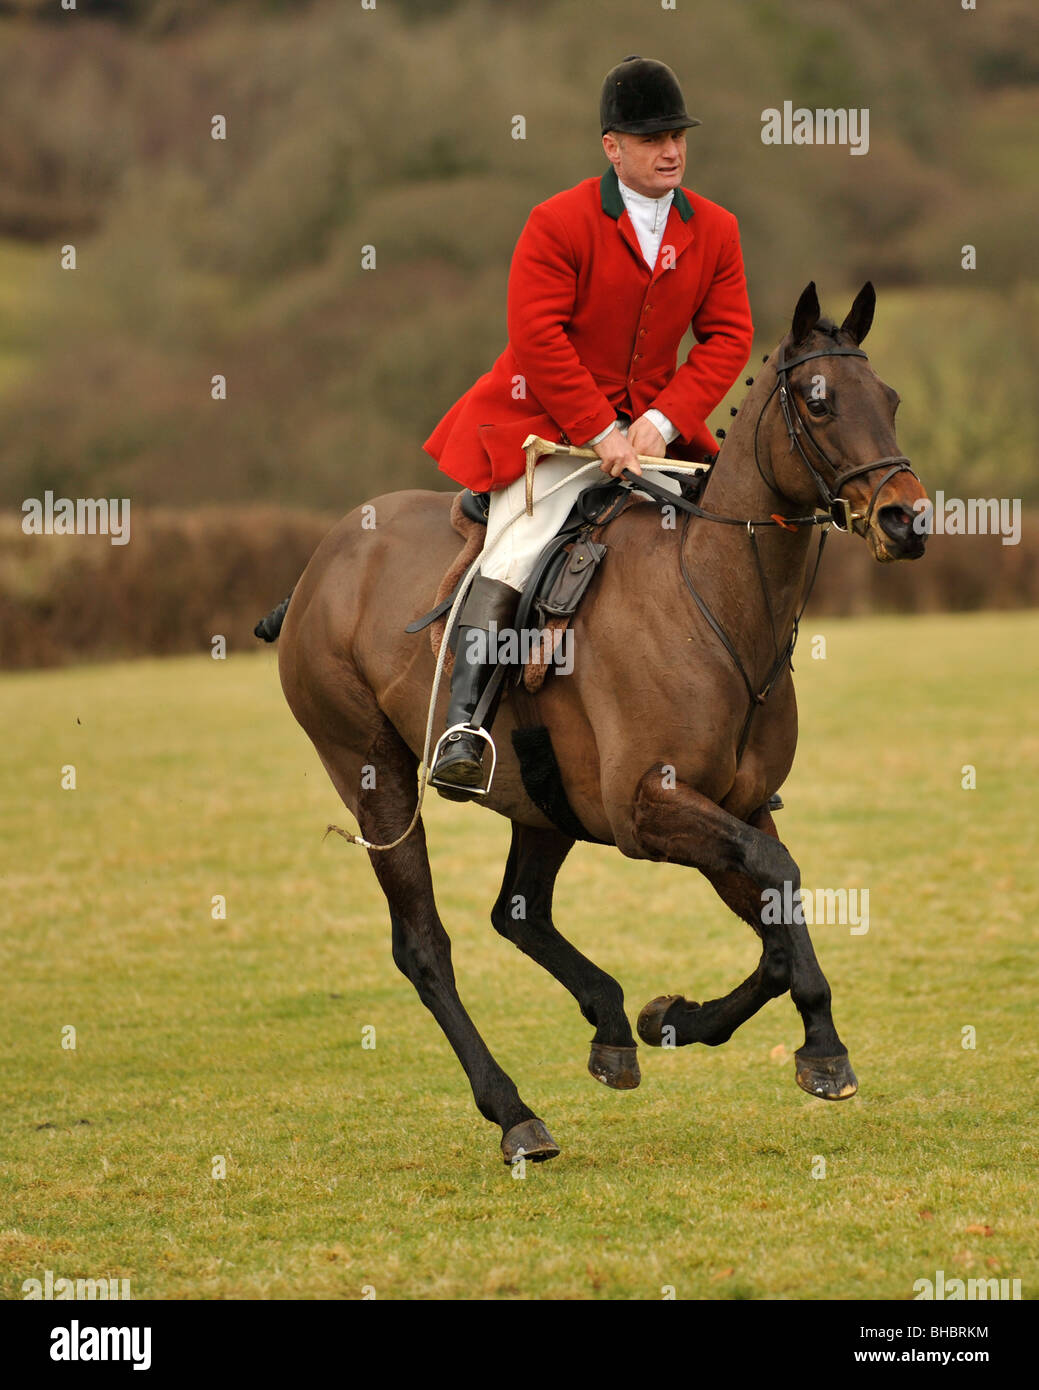 david lewis huntsman of lamerton foxhounds, galloping after hounds - Stock Image